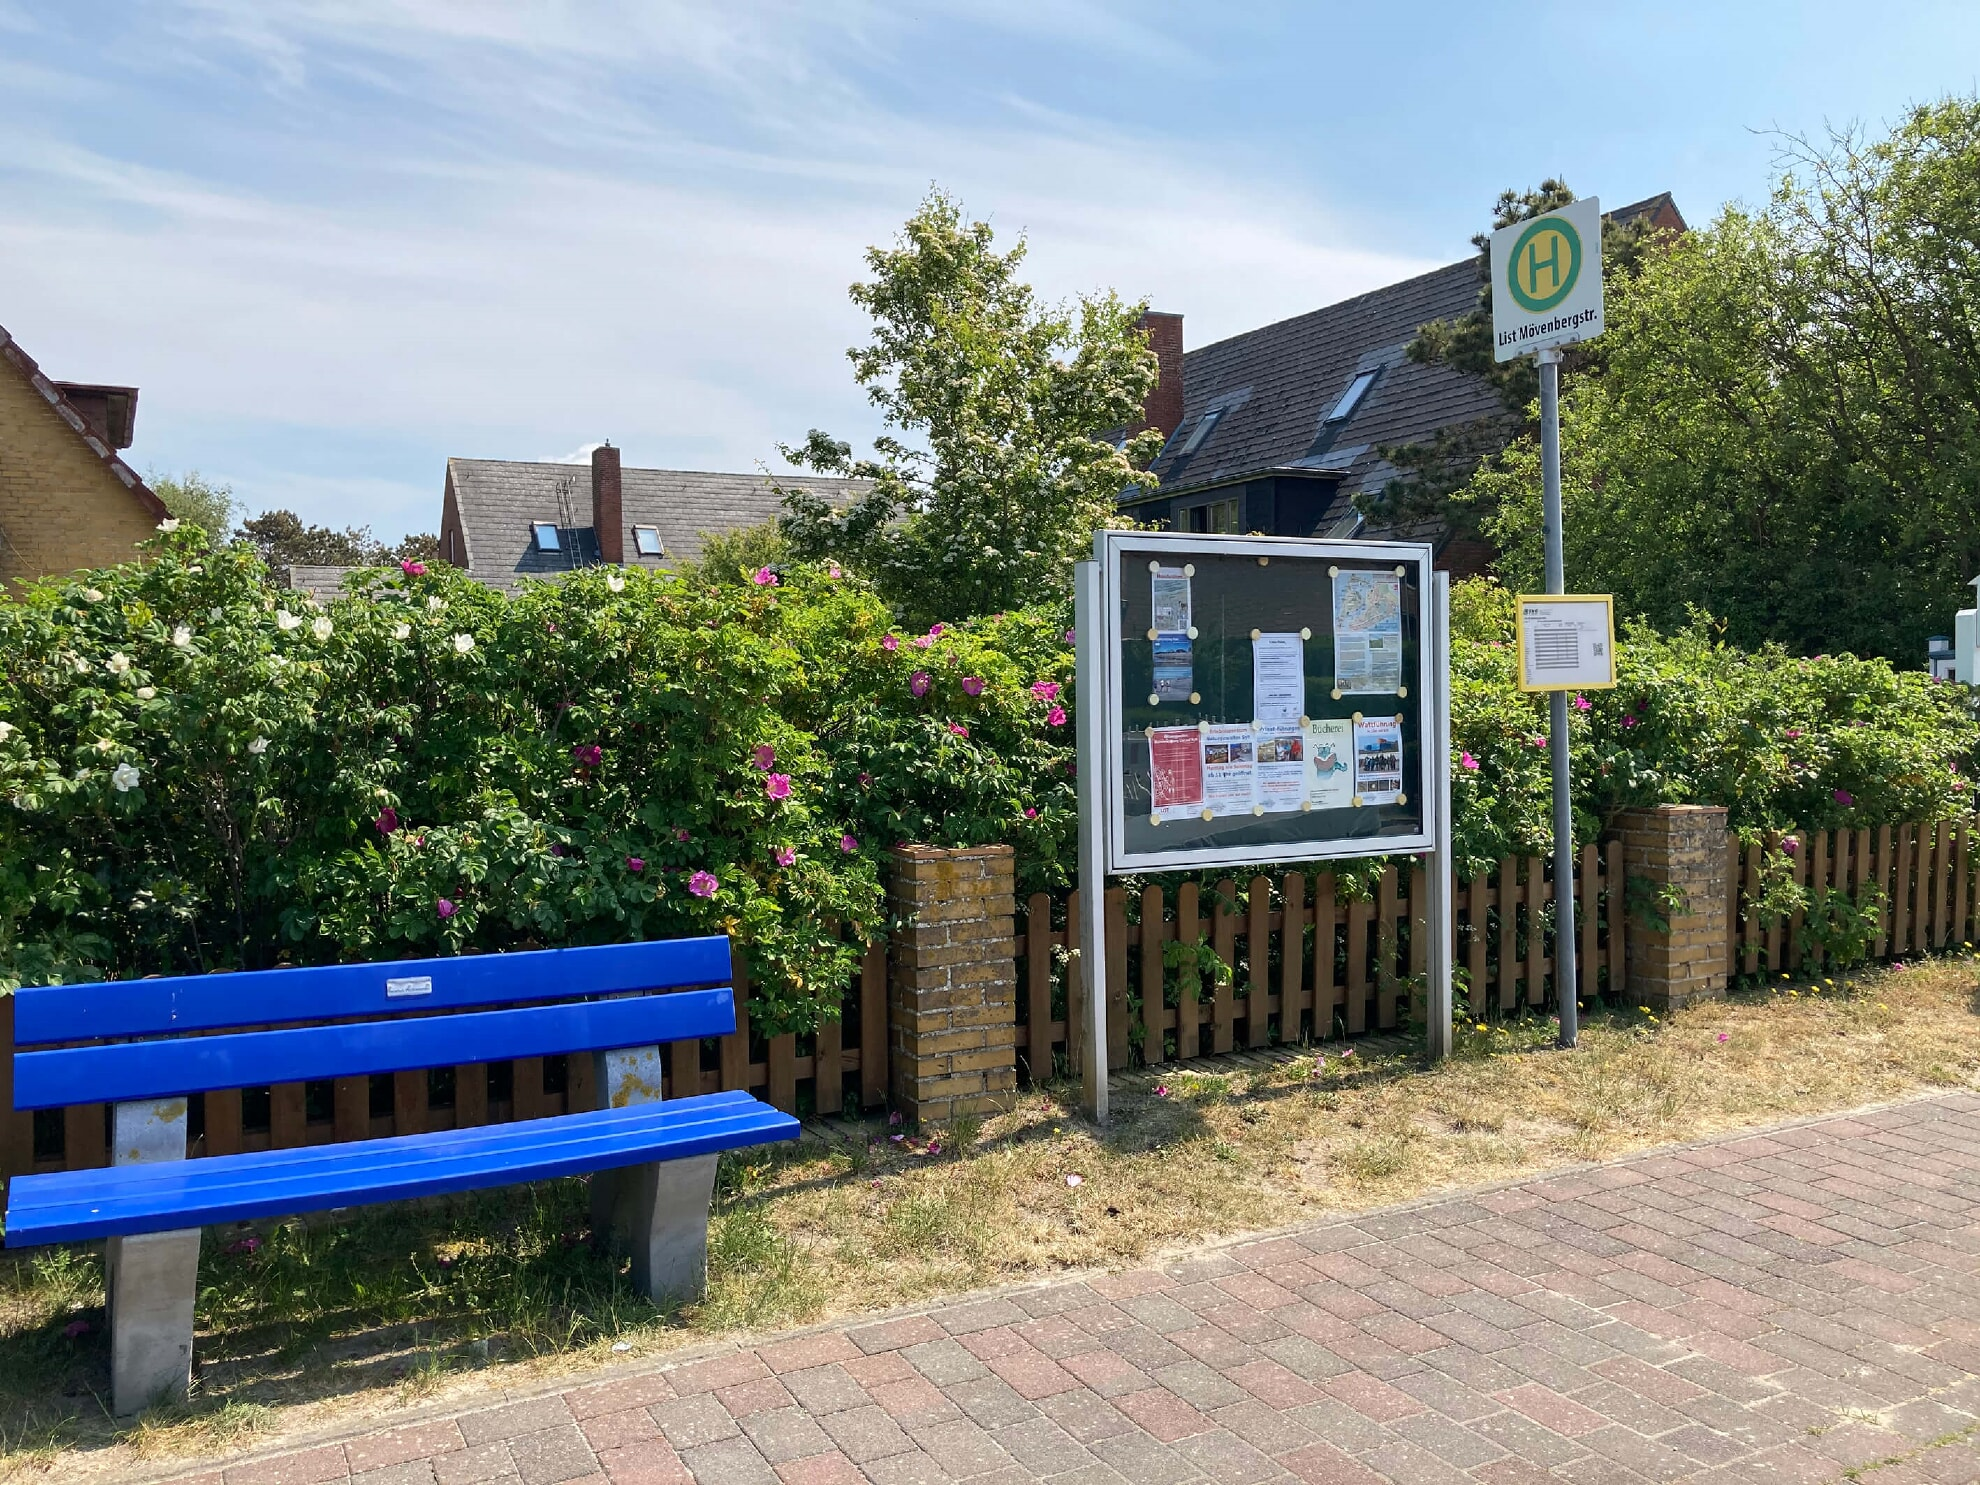 Bushaltestelle Mövenbergstraße Richtung Westerland